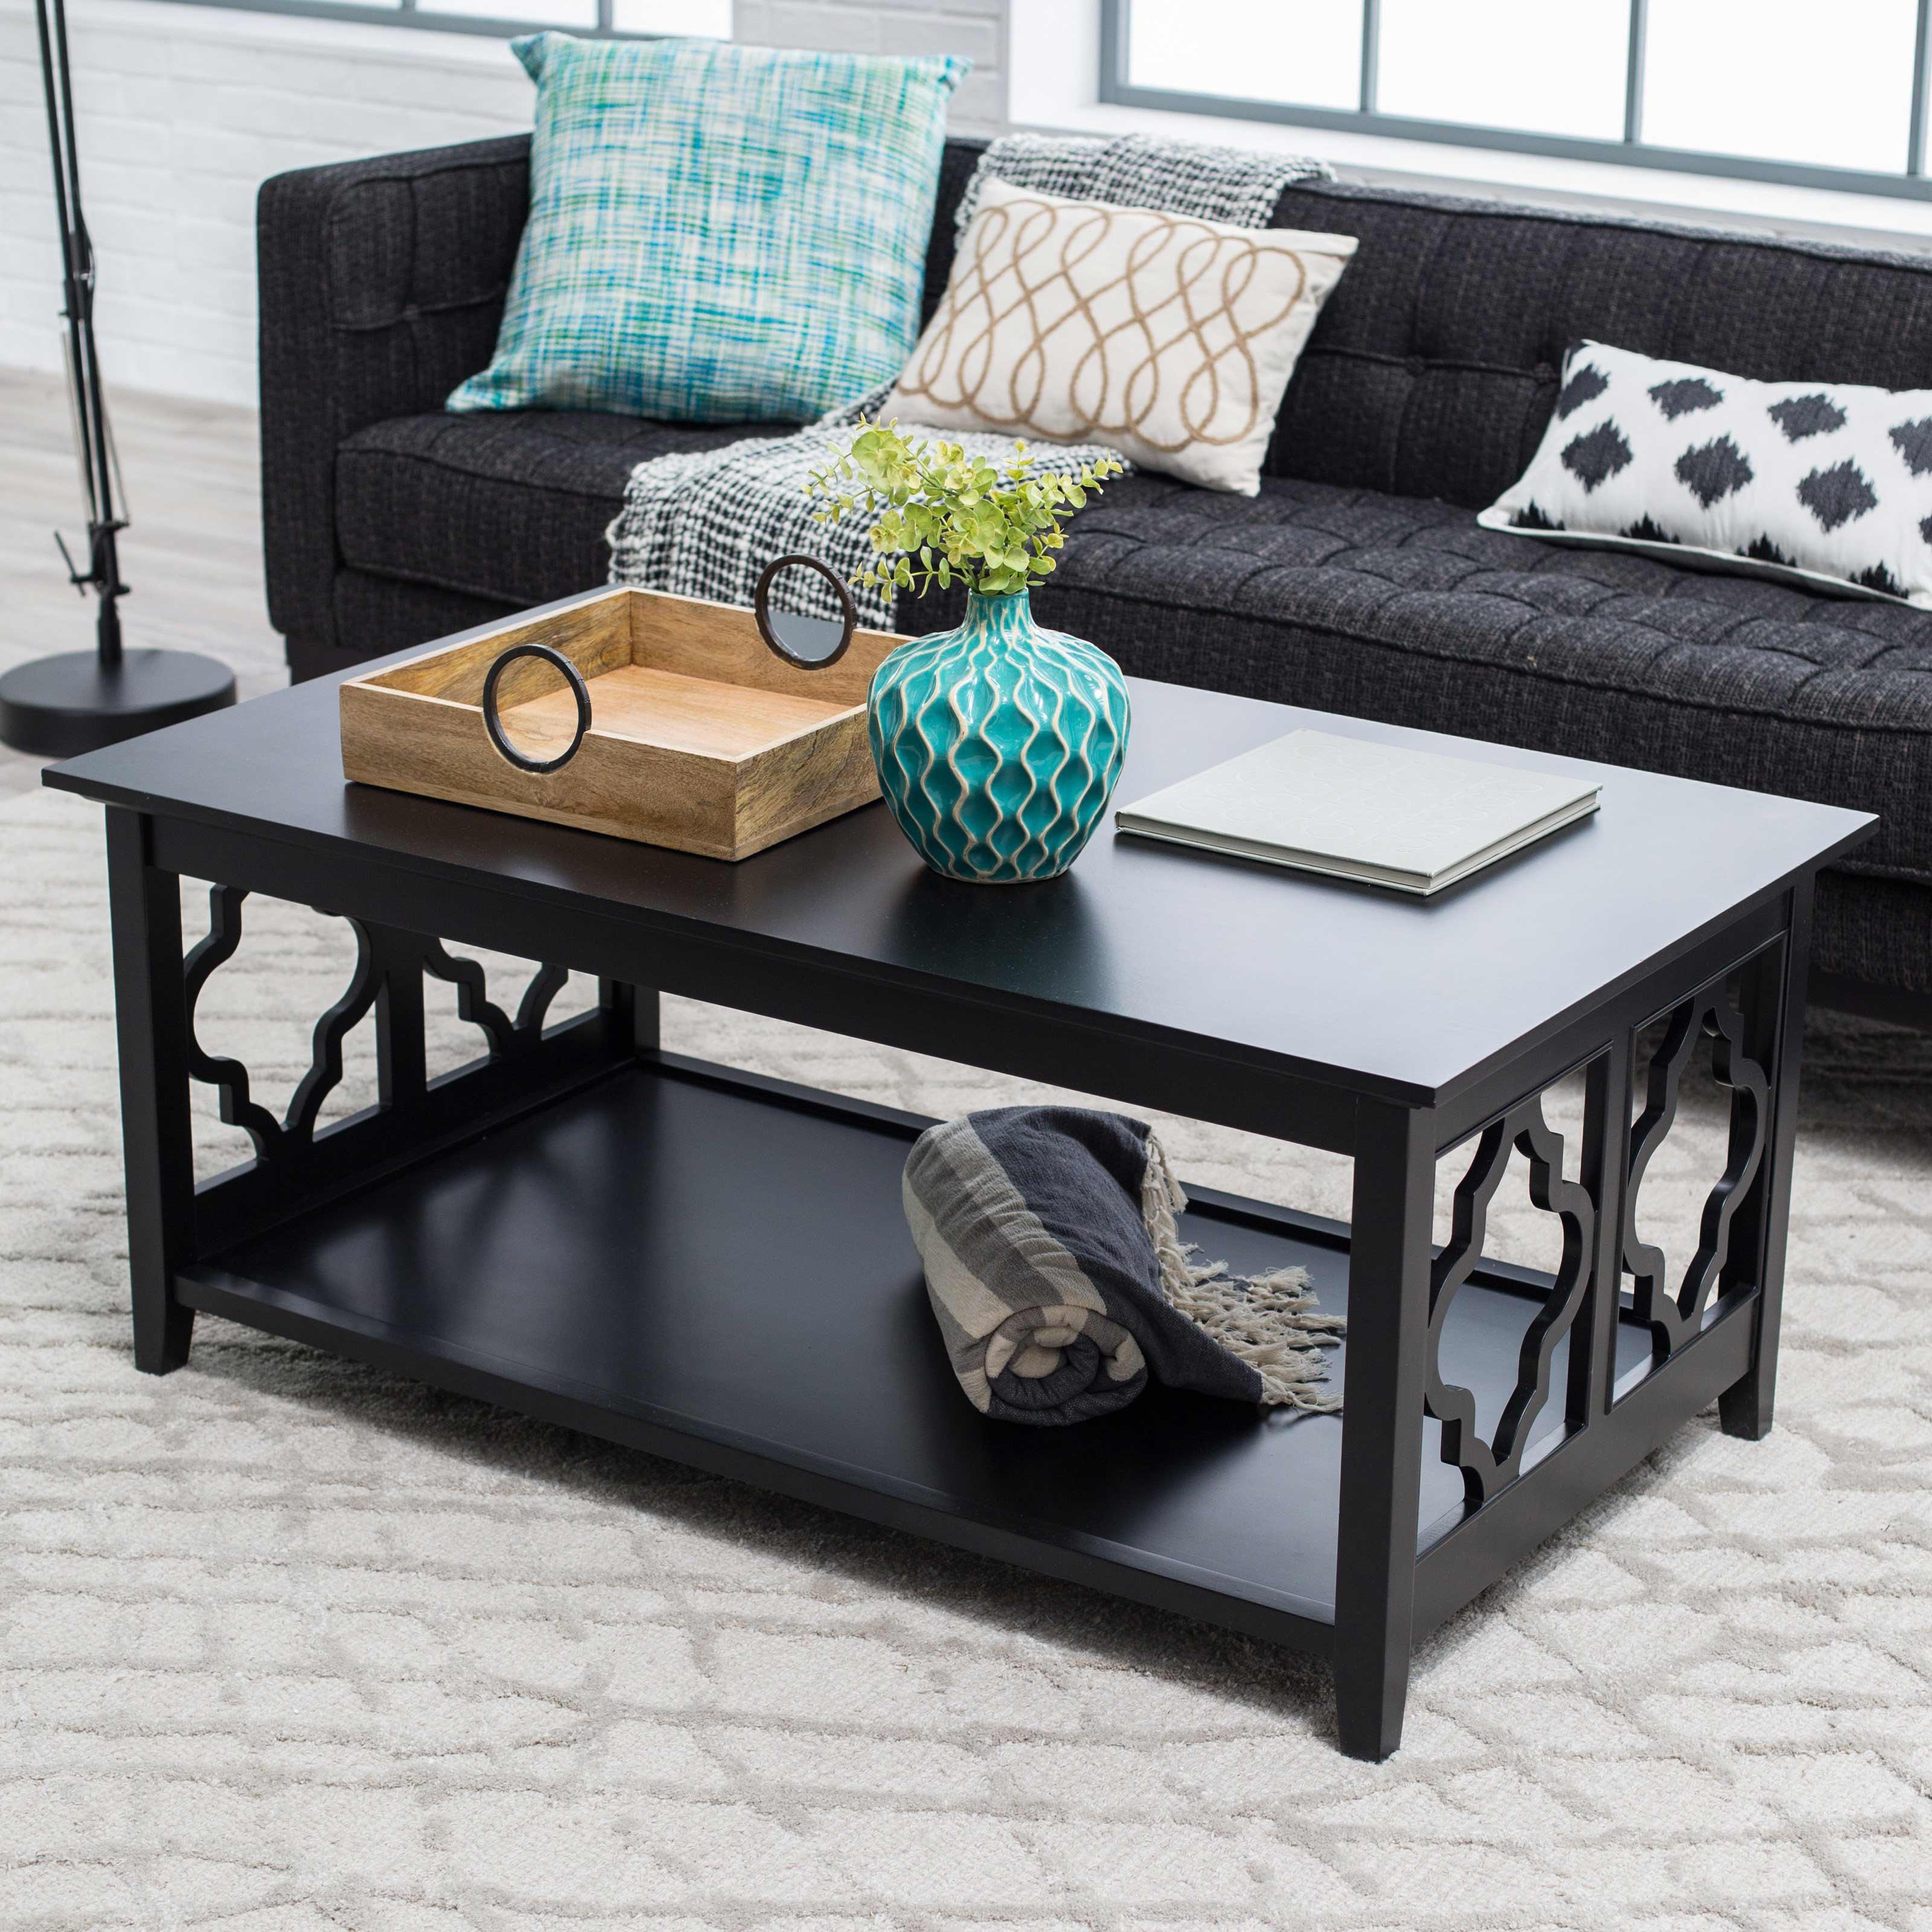 quatrefoil coffee table 29